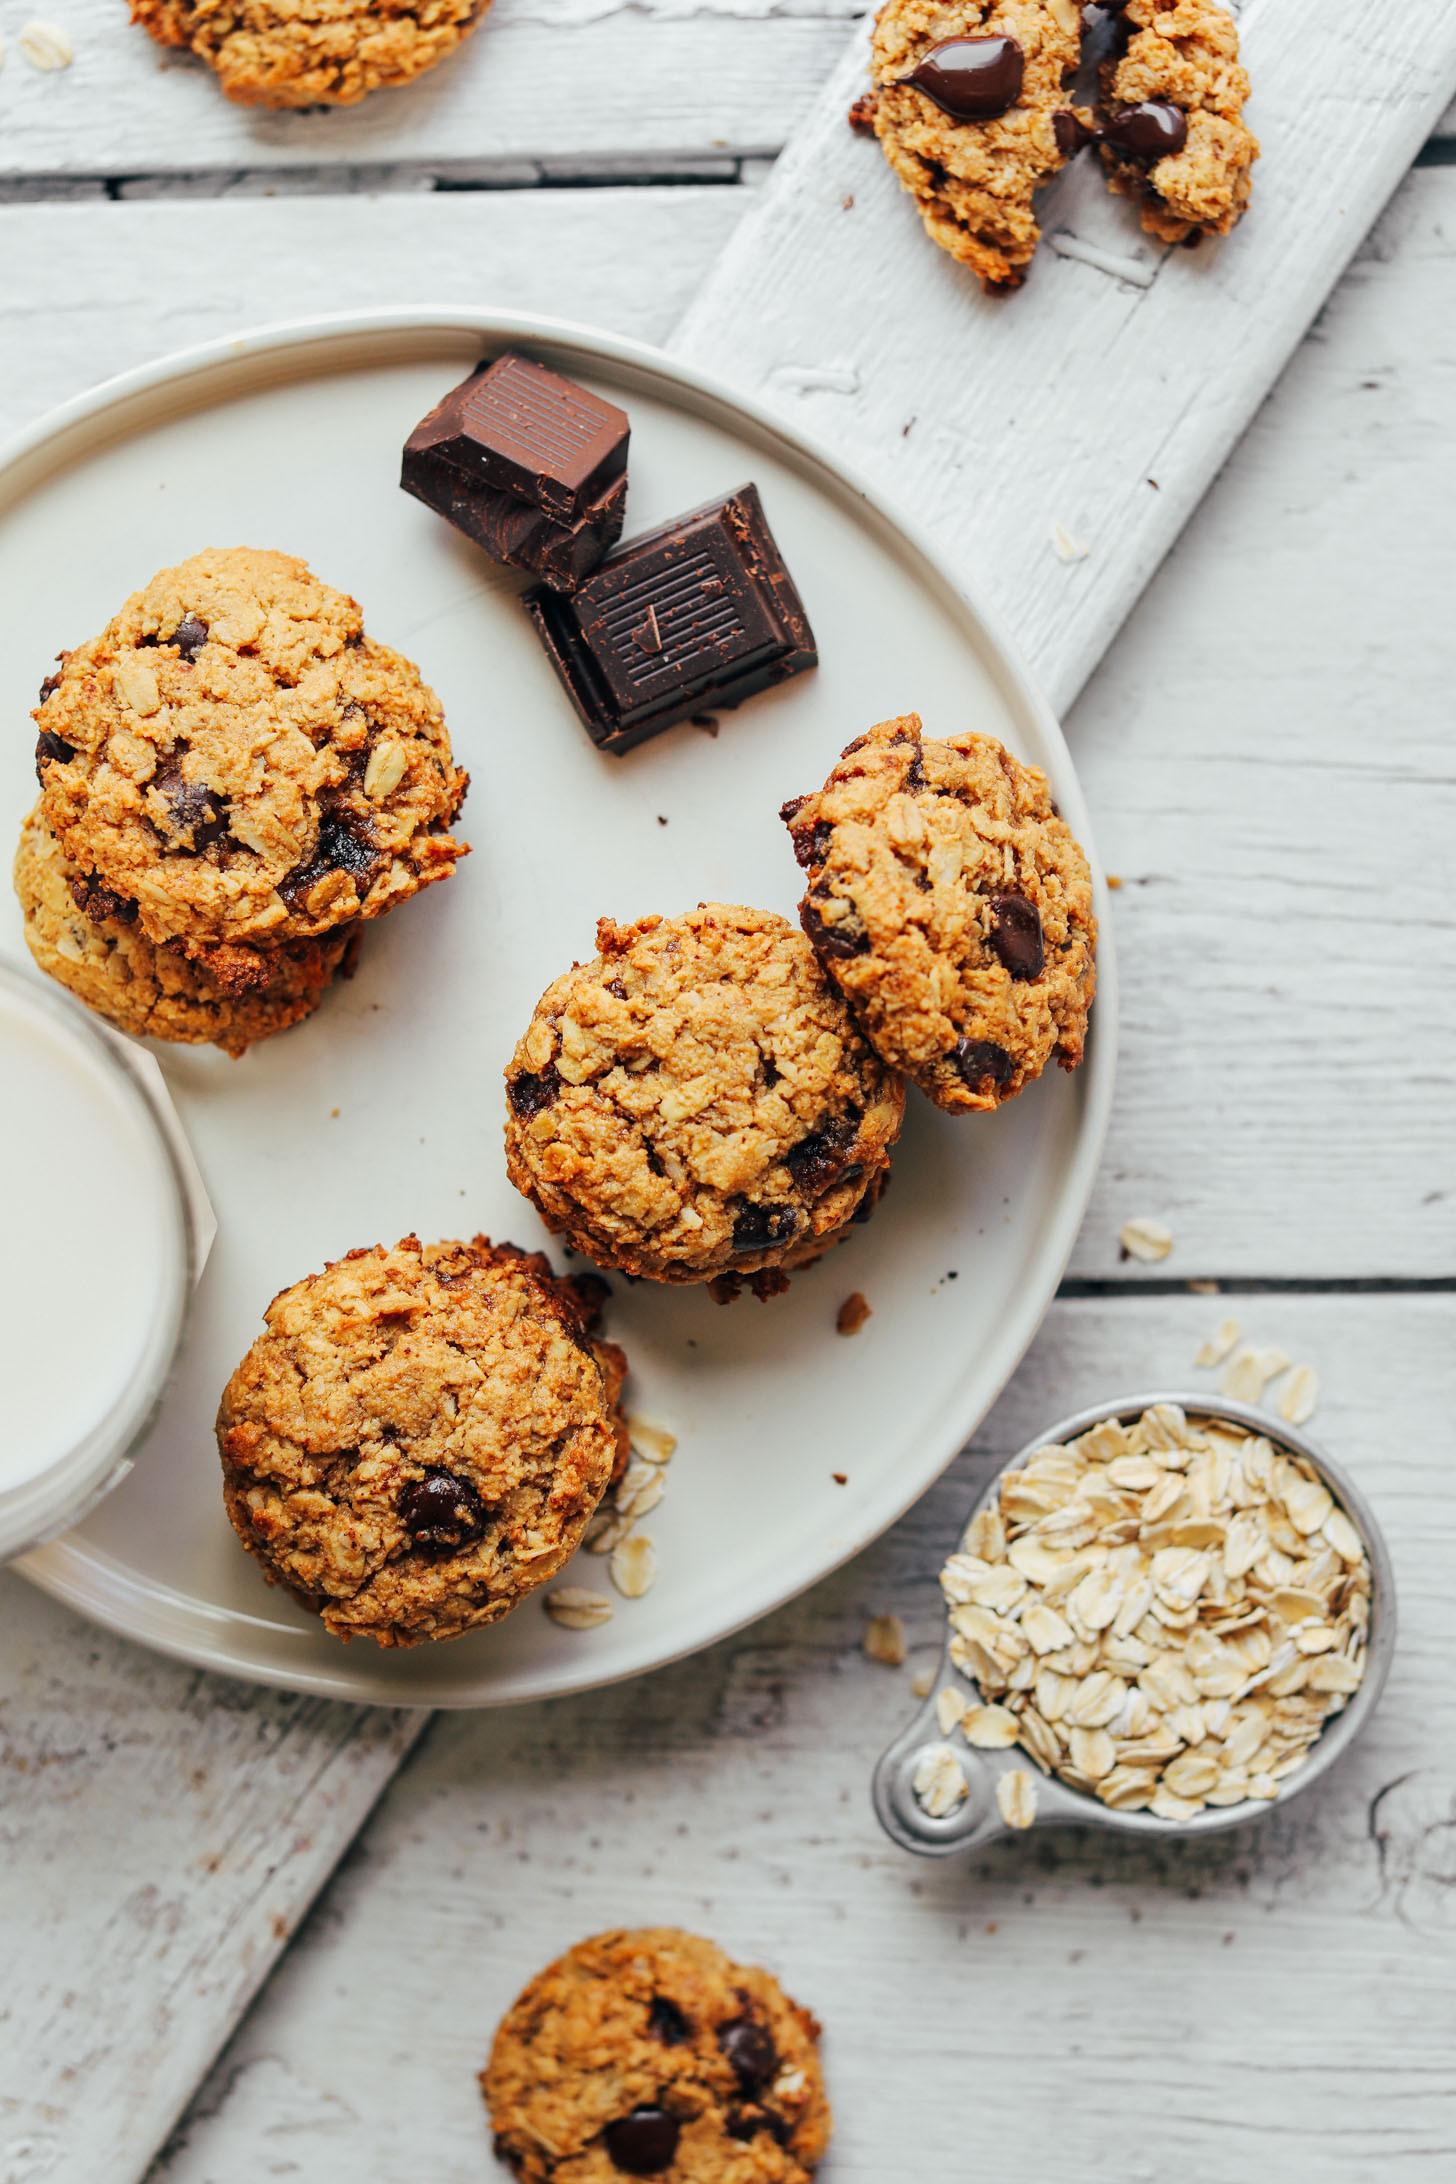 Healthy Homemade Oatmeal Cookies  Gluten Free Oatmeal Chocolate Chip Cookies